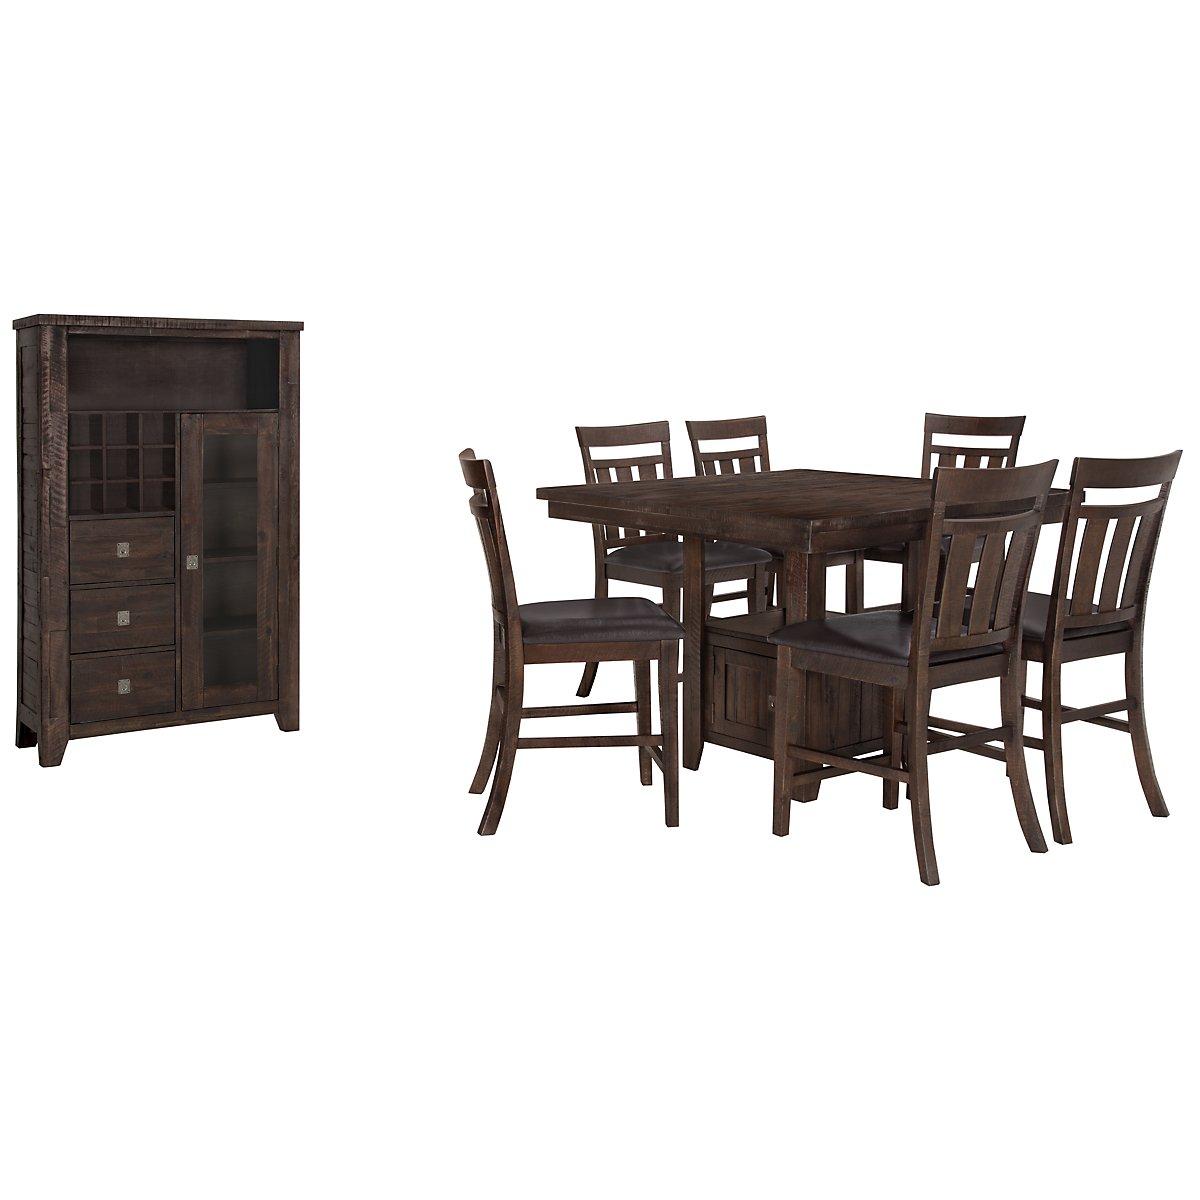 Kona Grove Dark Tone High Small Dining Room